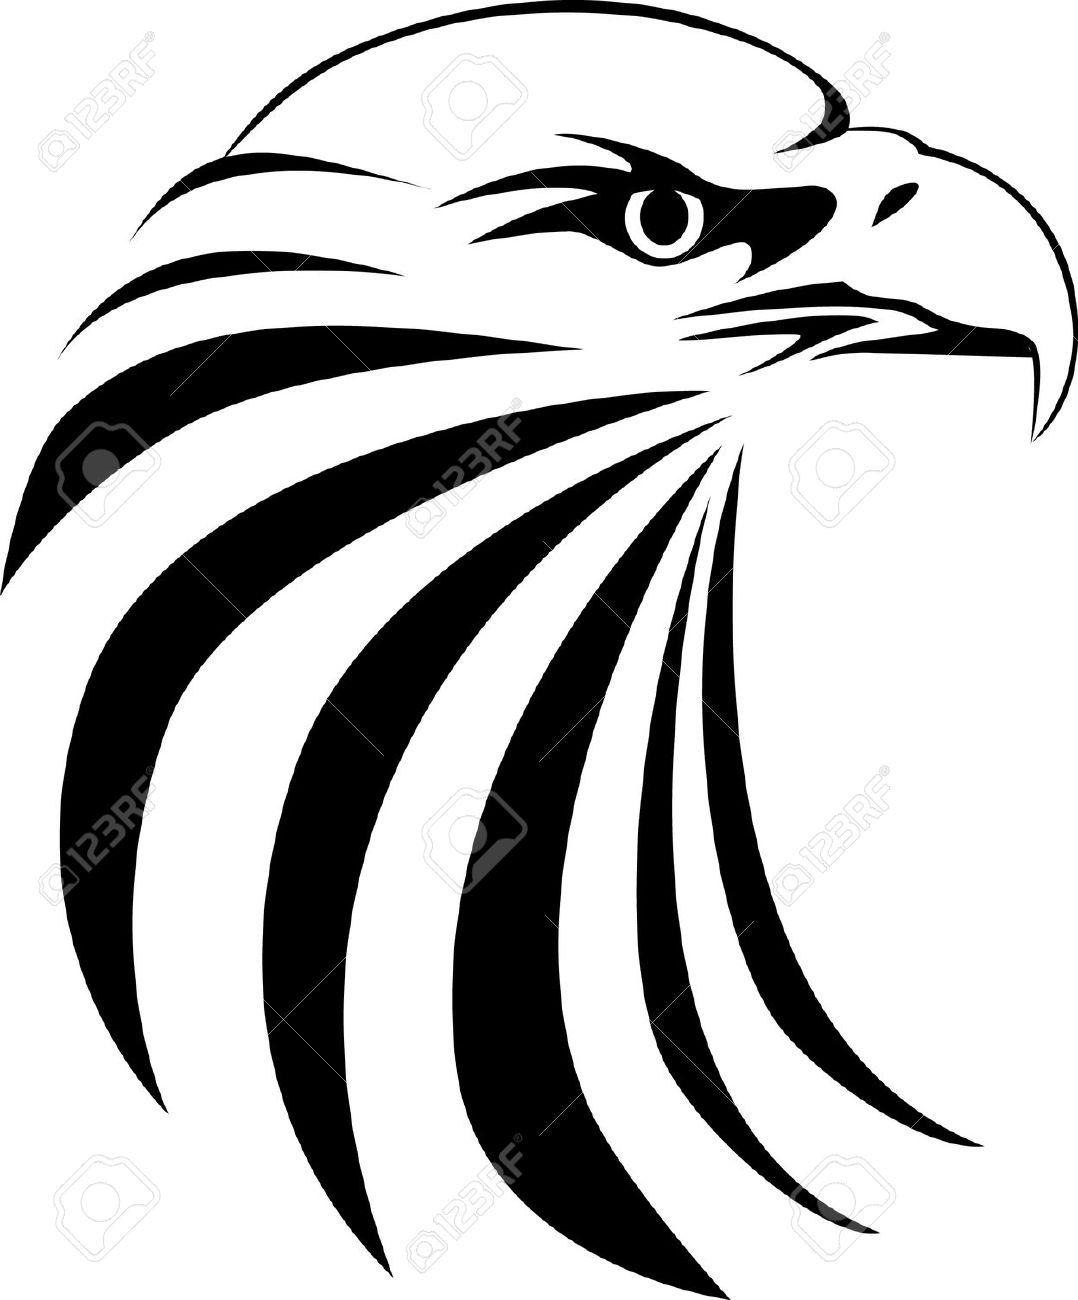 Beak clipart vertebrate Tribal Hawk Tribal cliparts Clipart